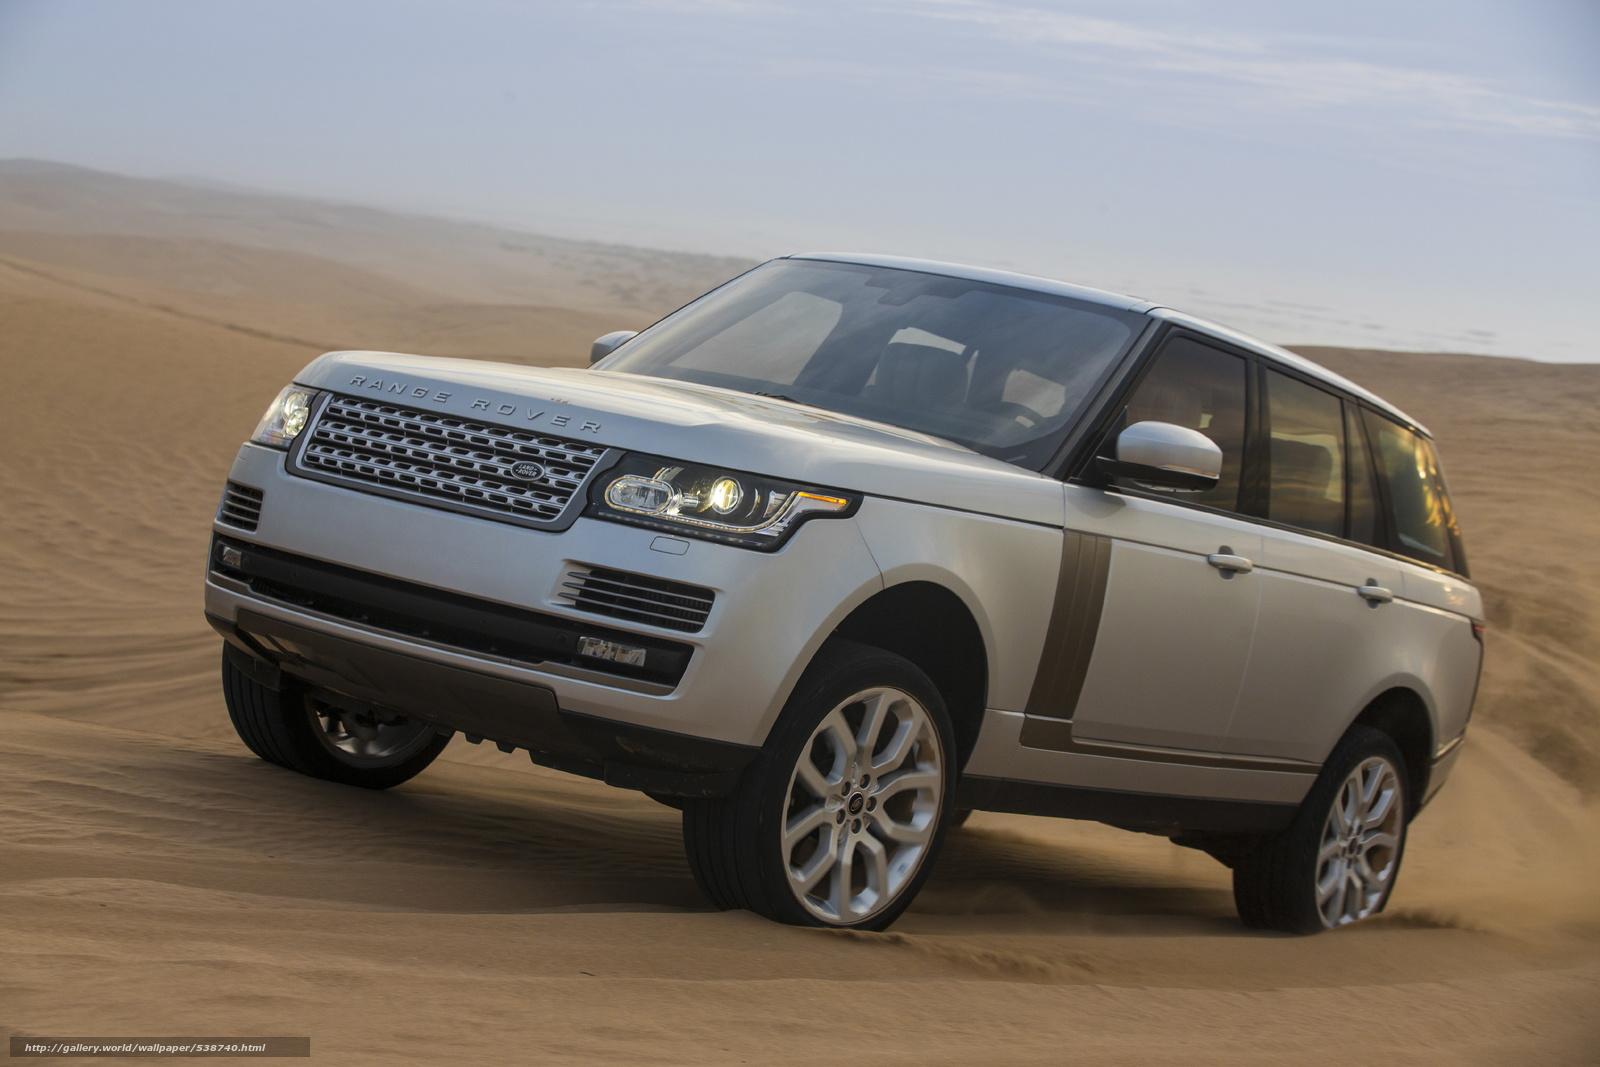 Tlcharger Fond D Ecran 2013 Land Rover Range Rover Fonds